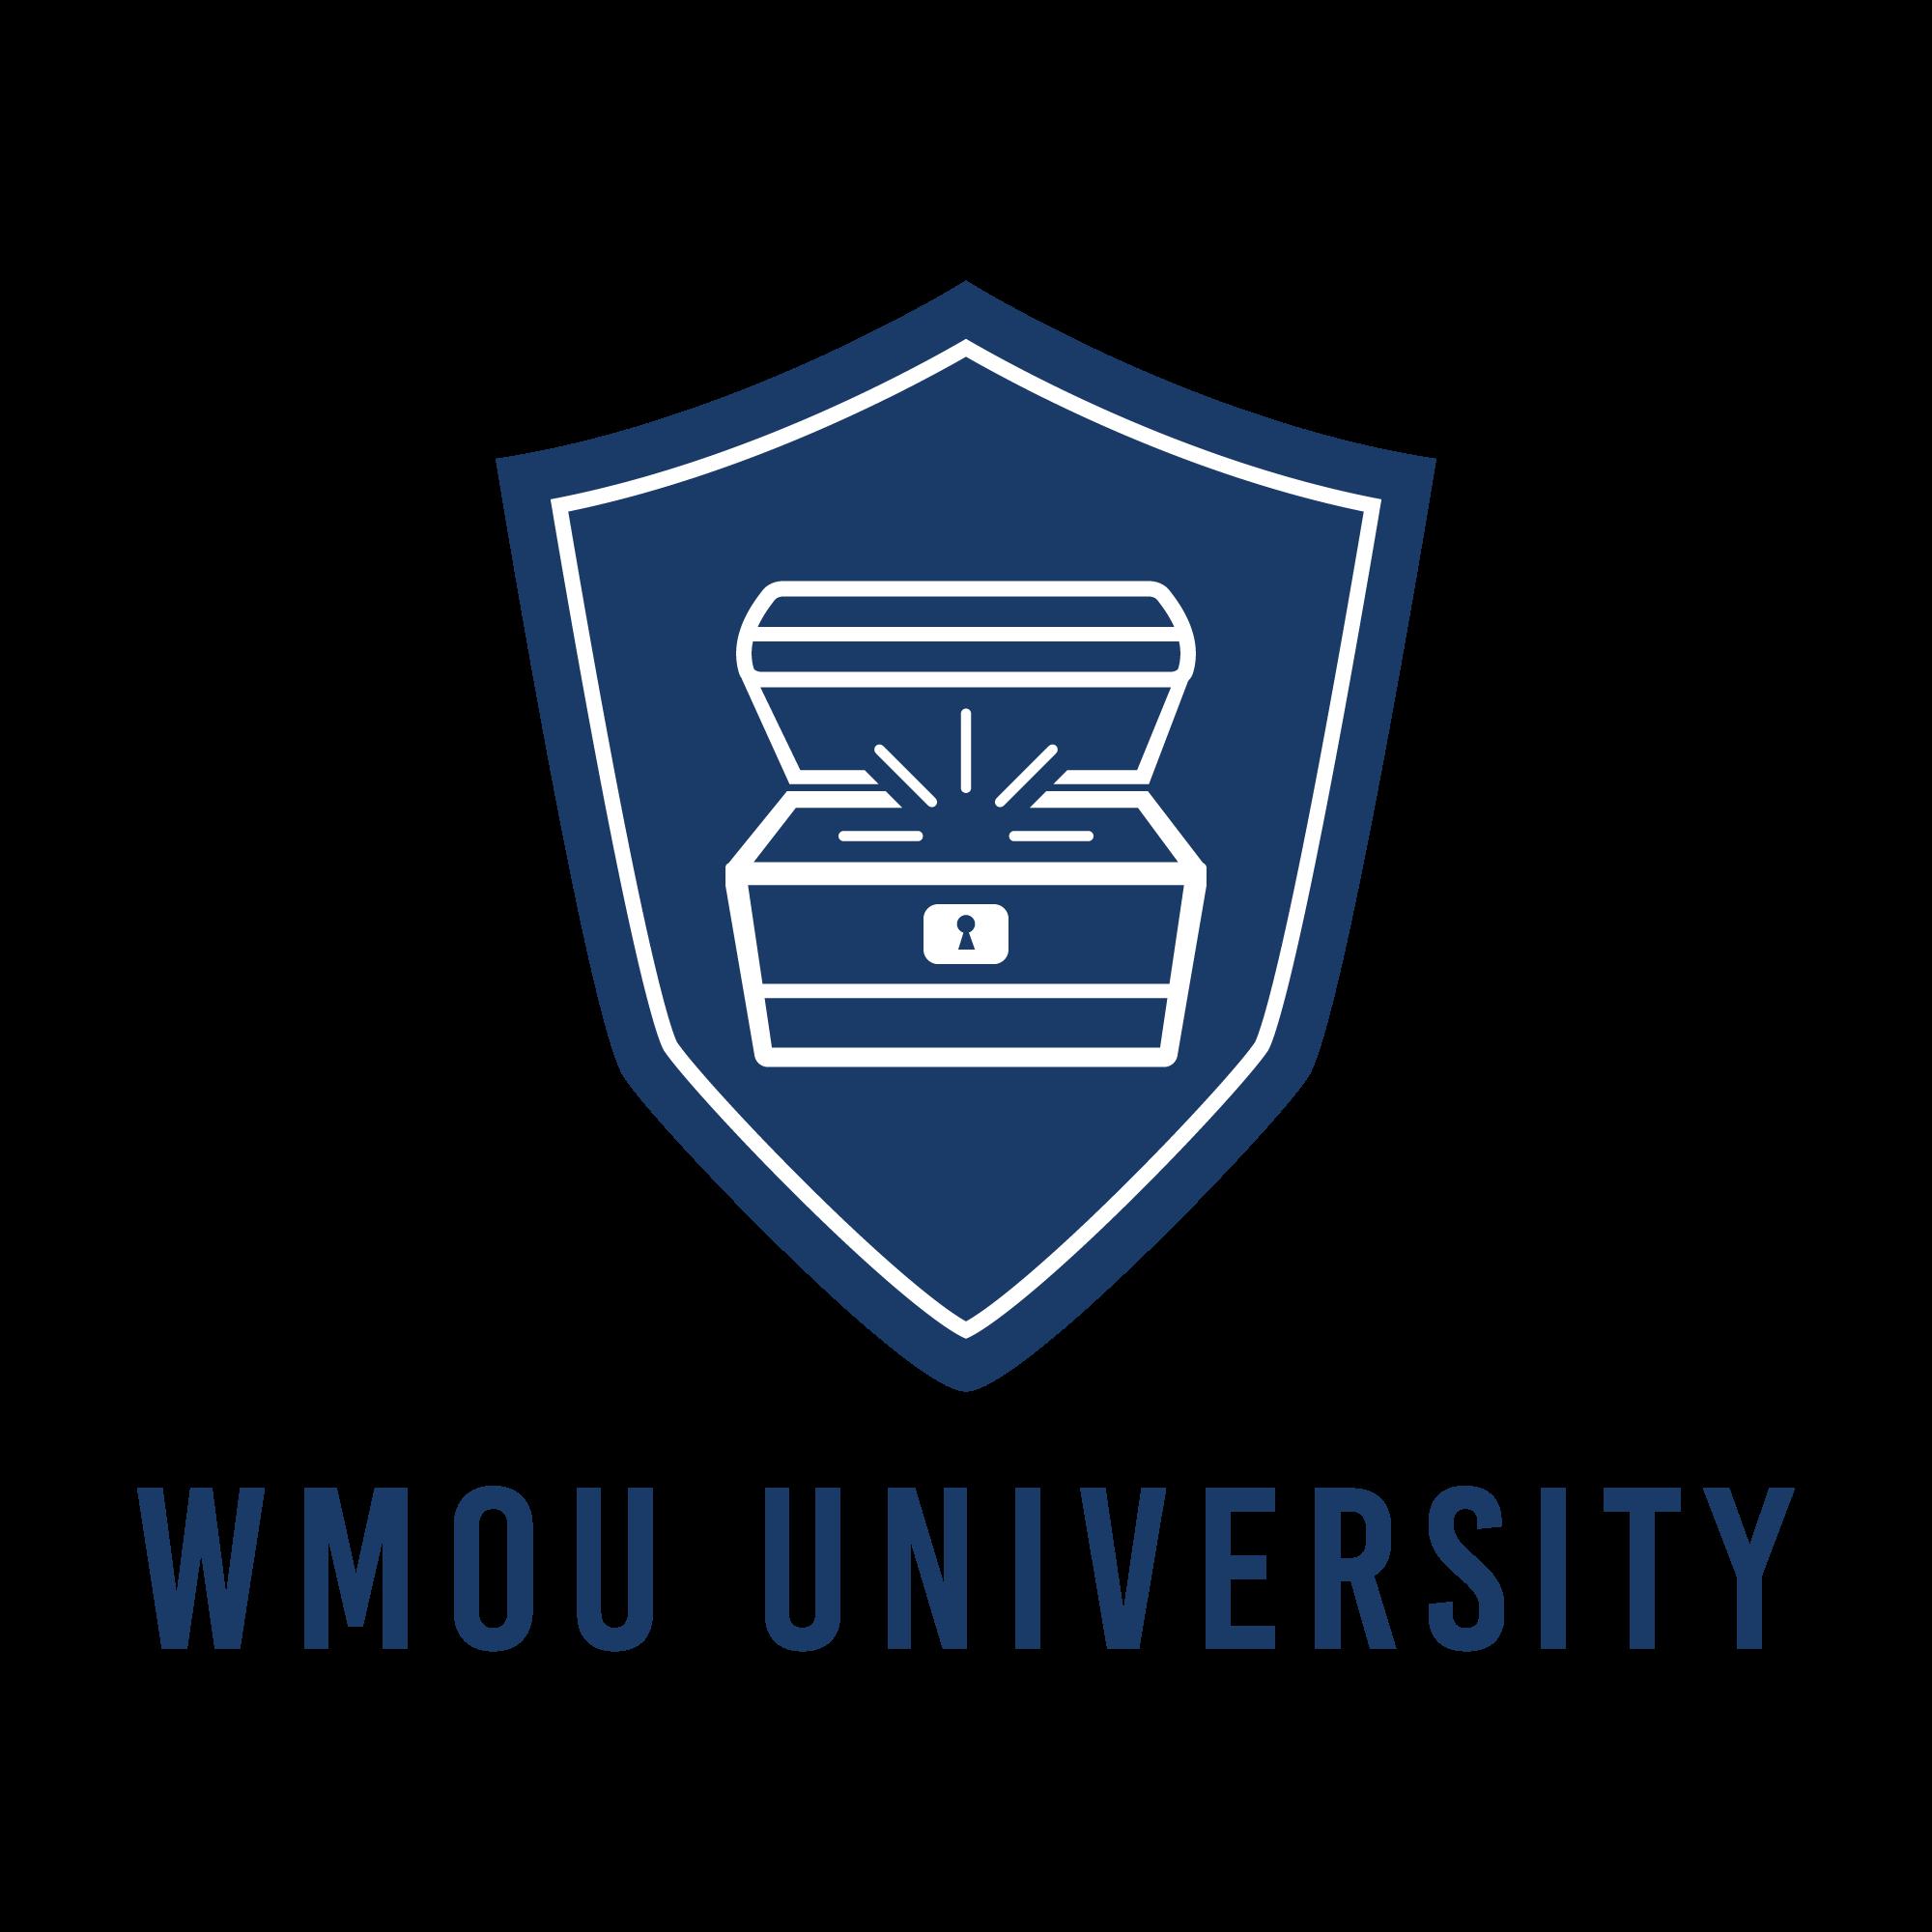 WMOU University